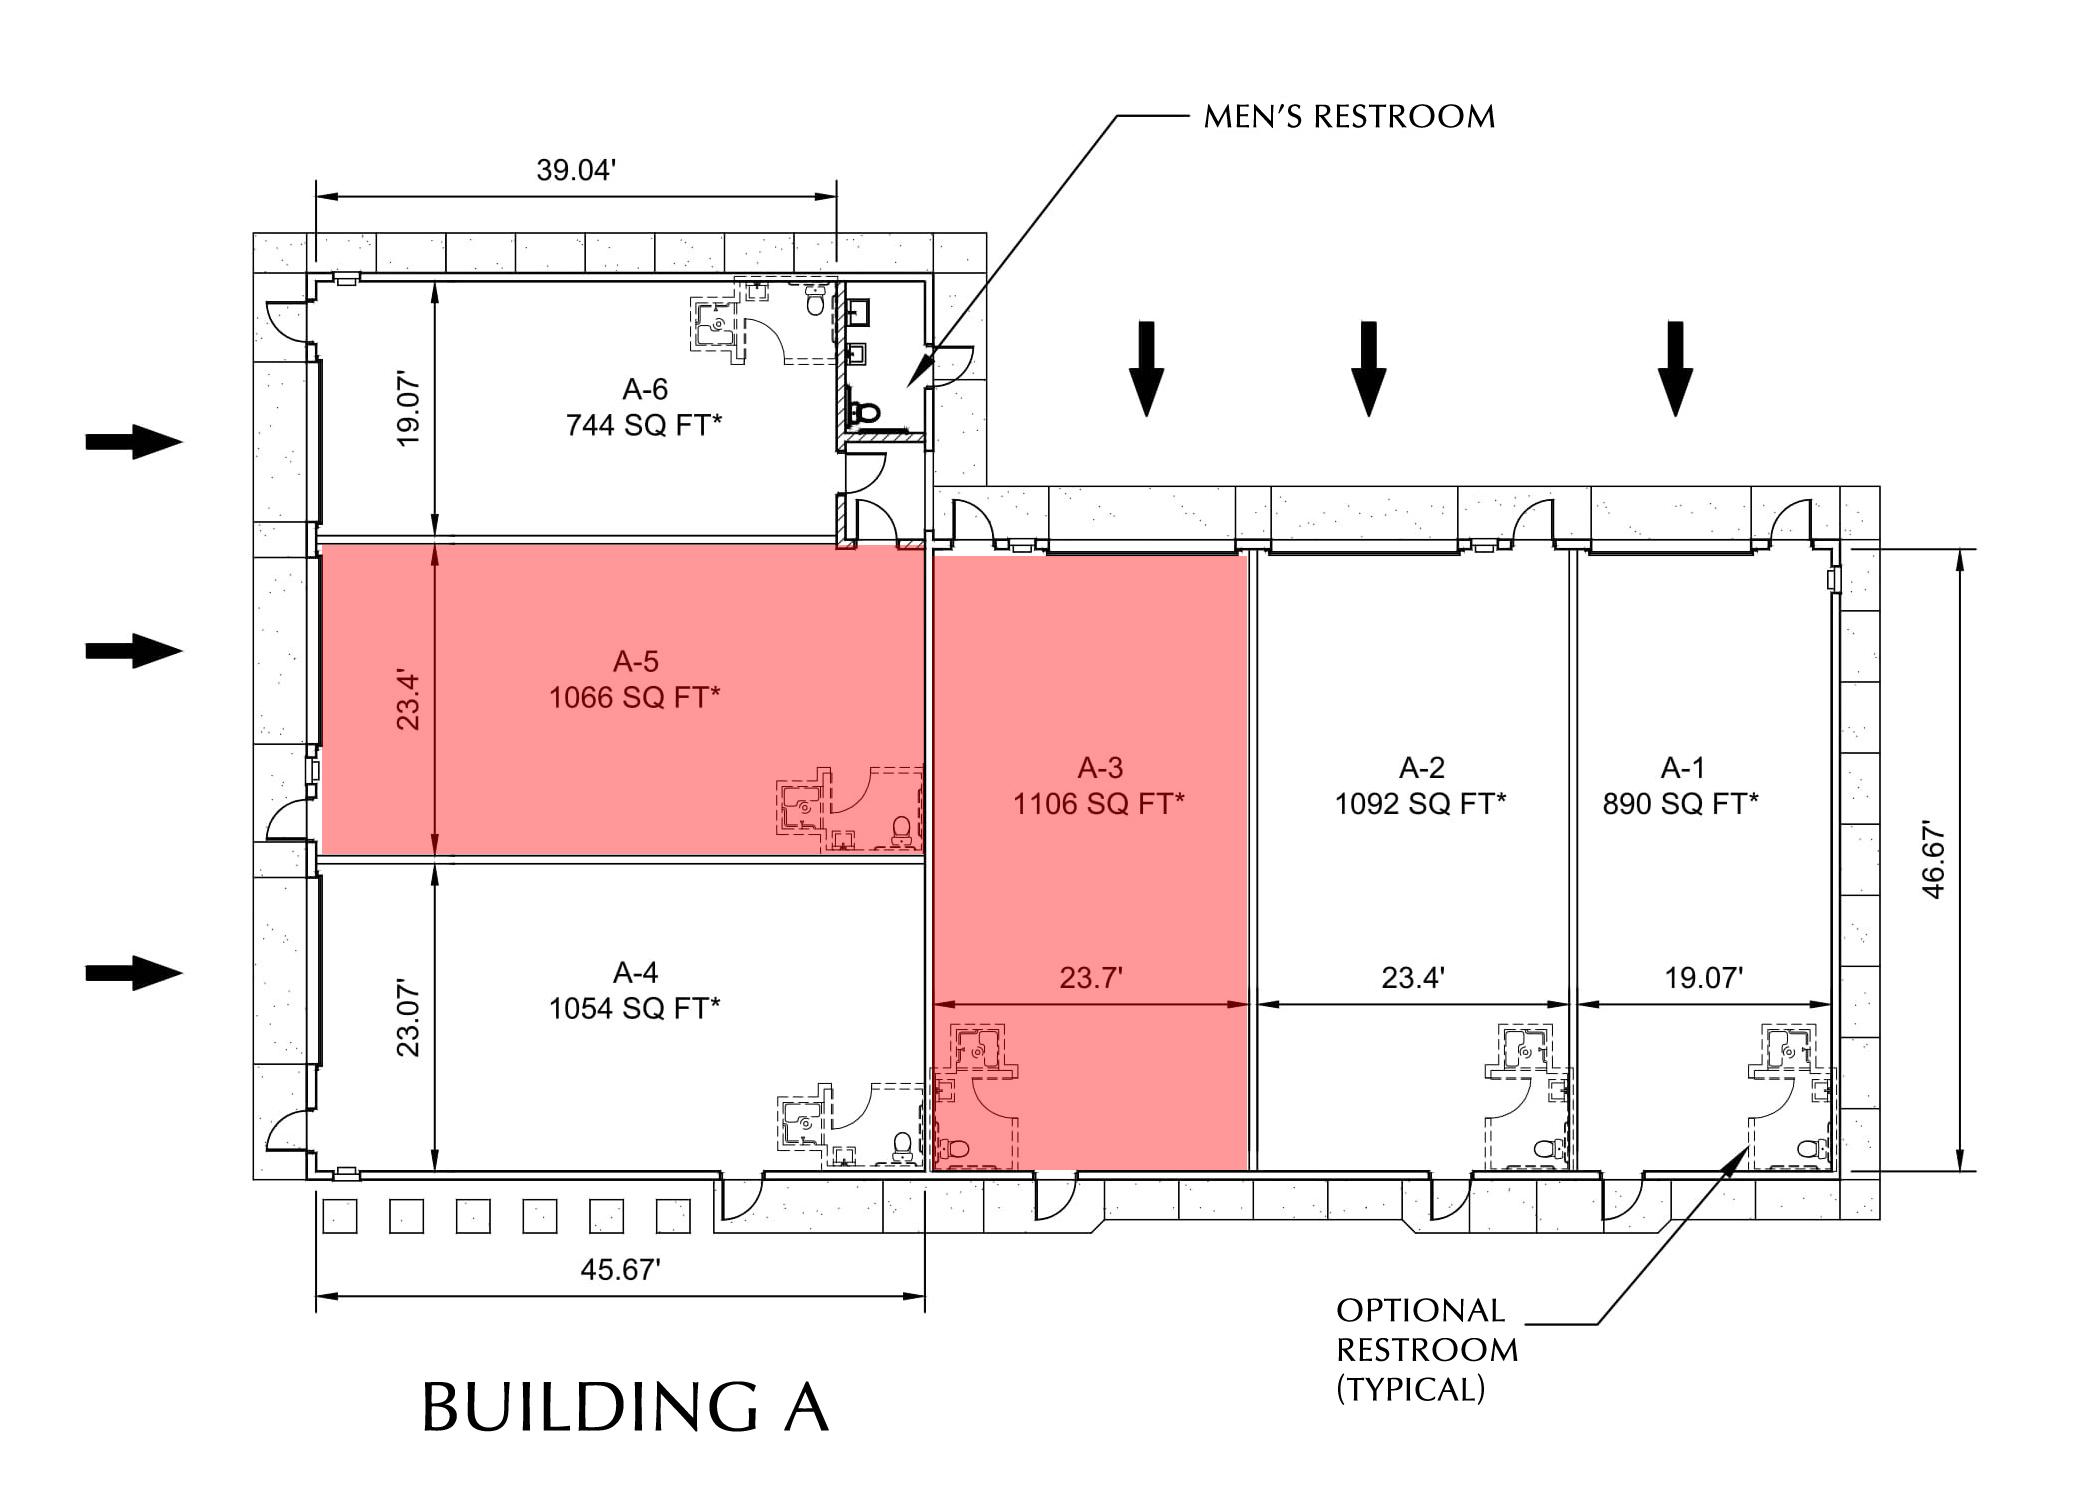 Building A 6 NoBorder.jpg